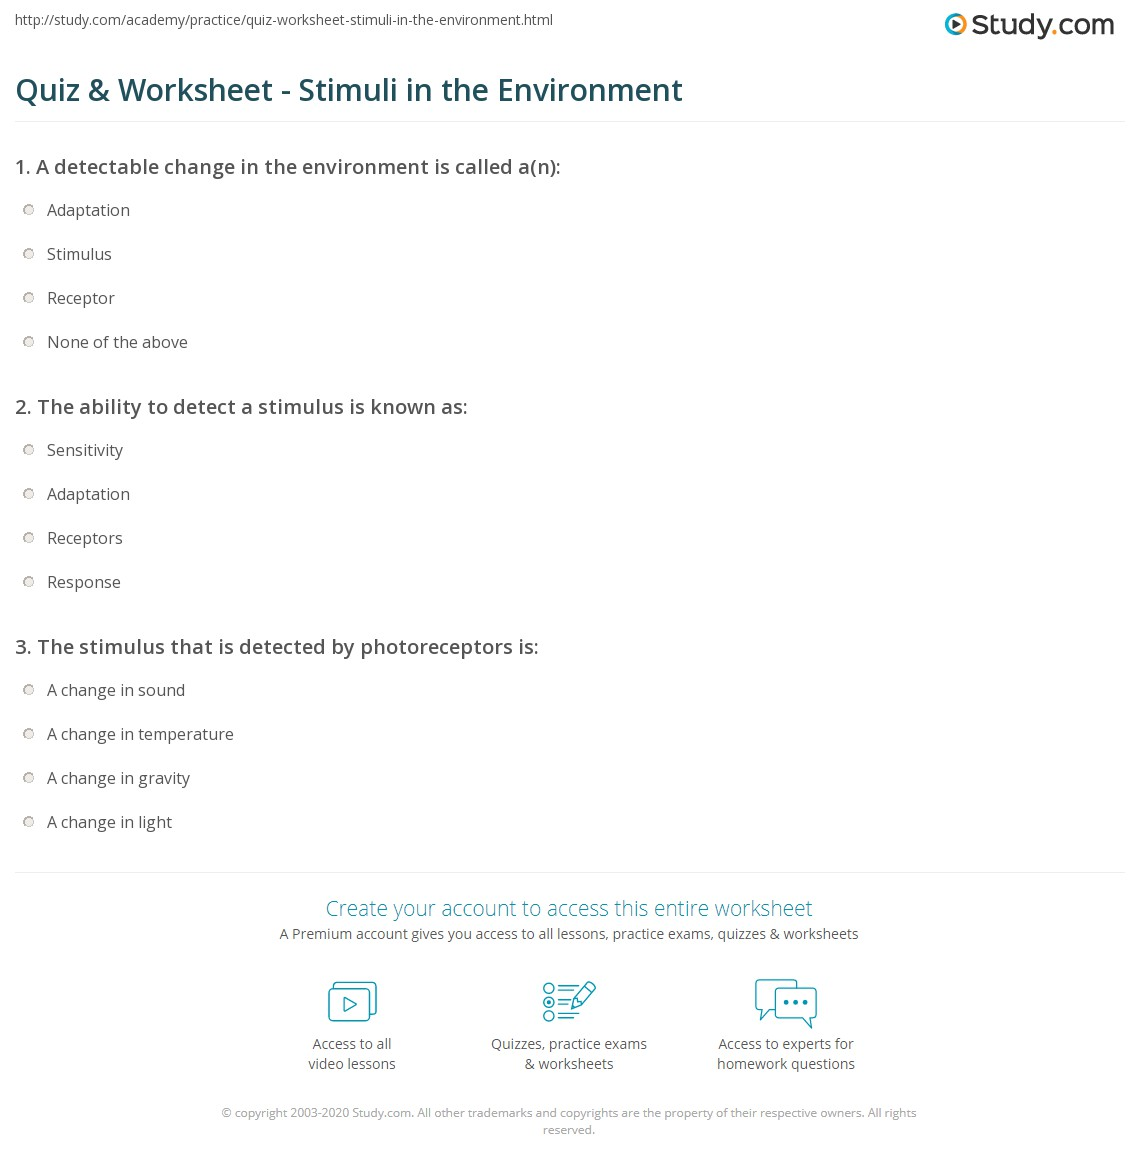 Quiz & Worksheet - Stimuli in the Environment   Study.com